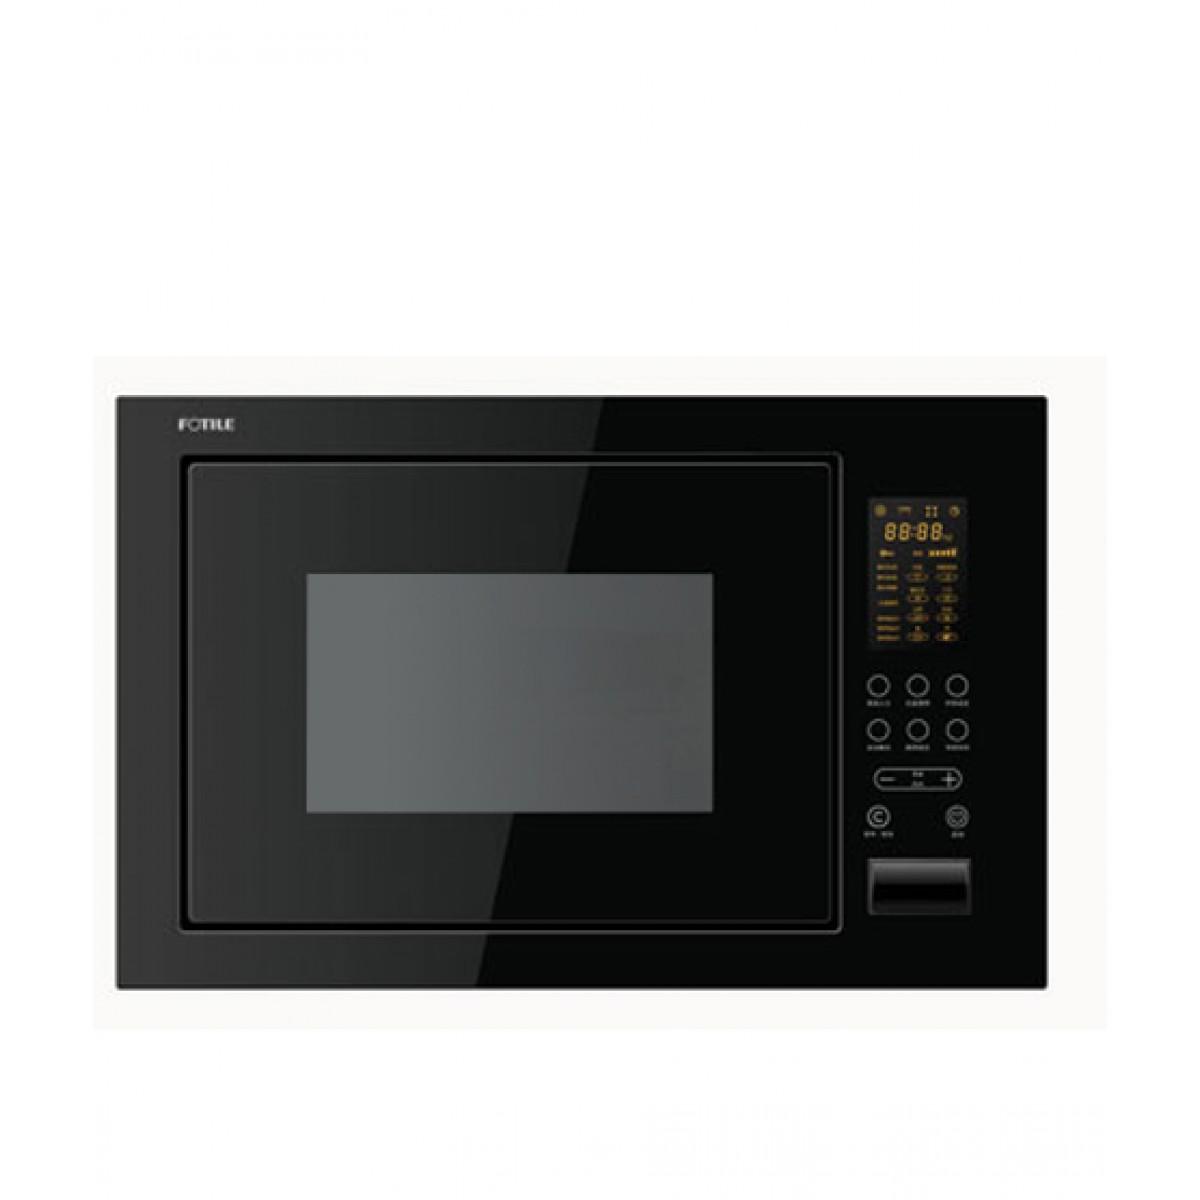 Fotile Built-in Microwave Oven 25Ltr (HW25800K-03B)